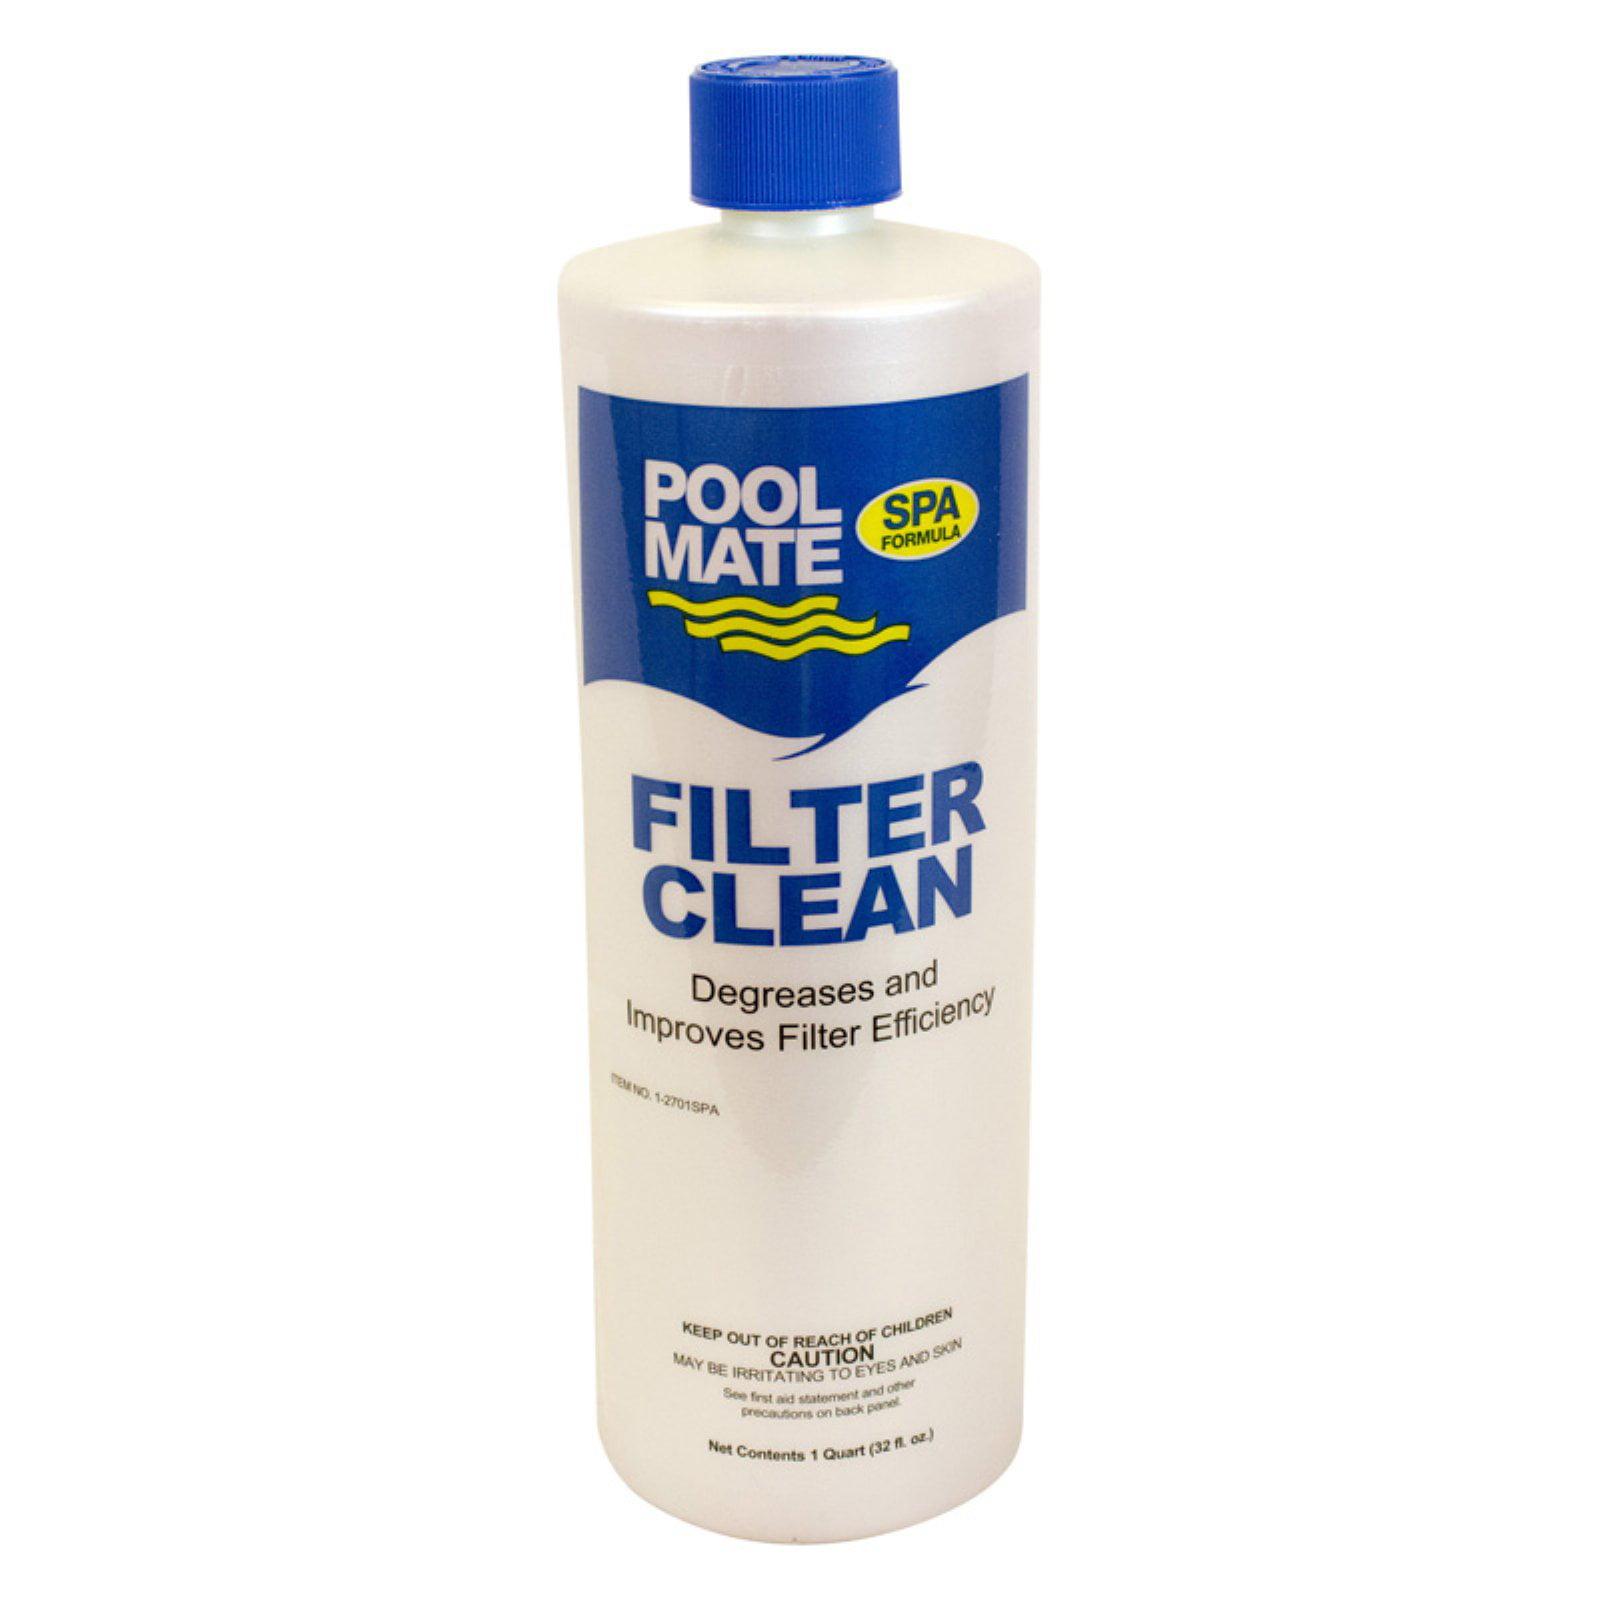 Pool Mate 1 qt. Filter Cleaner